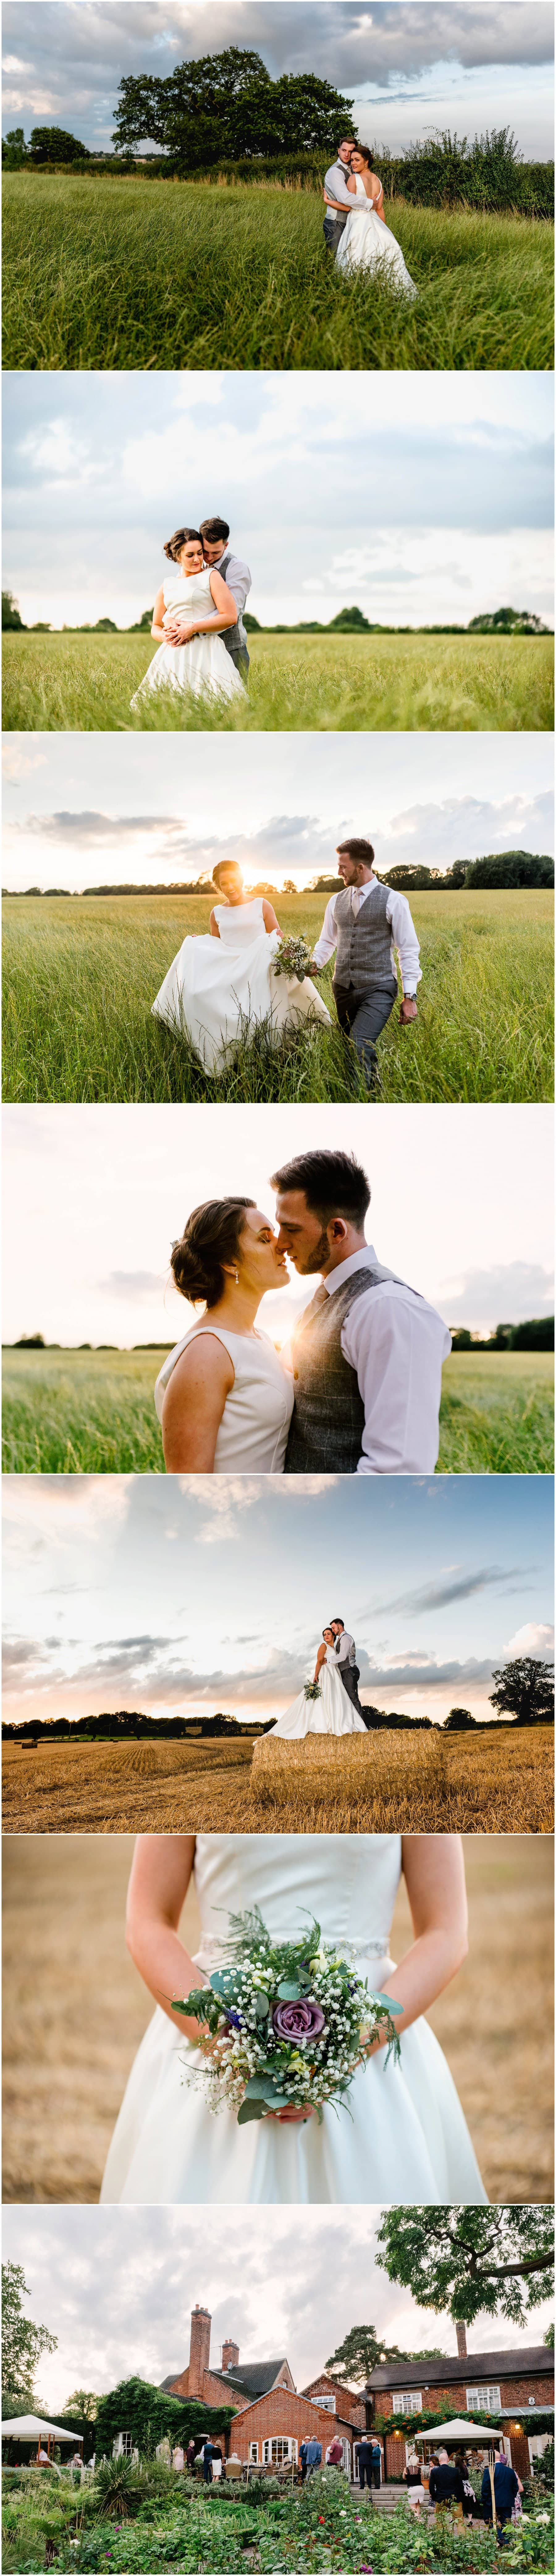 Goldstone Hall Wedding with photos by West Midlands Wedding Photographer Lisa Carpenter Photography.